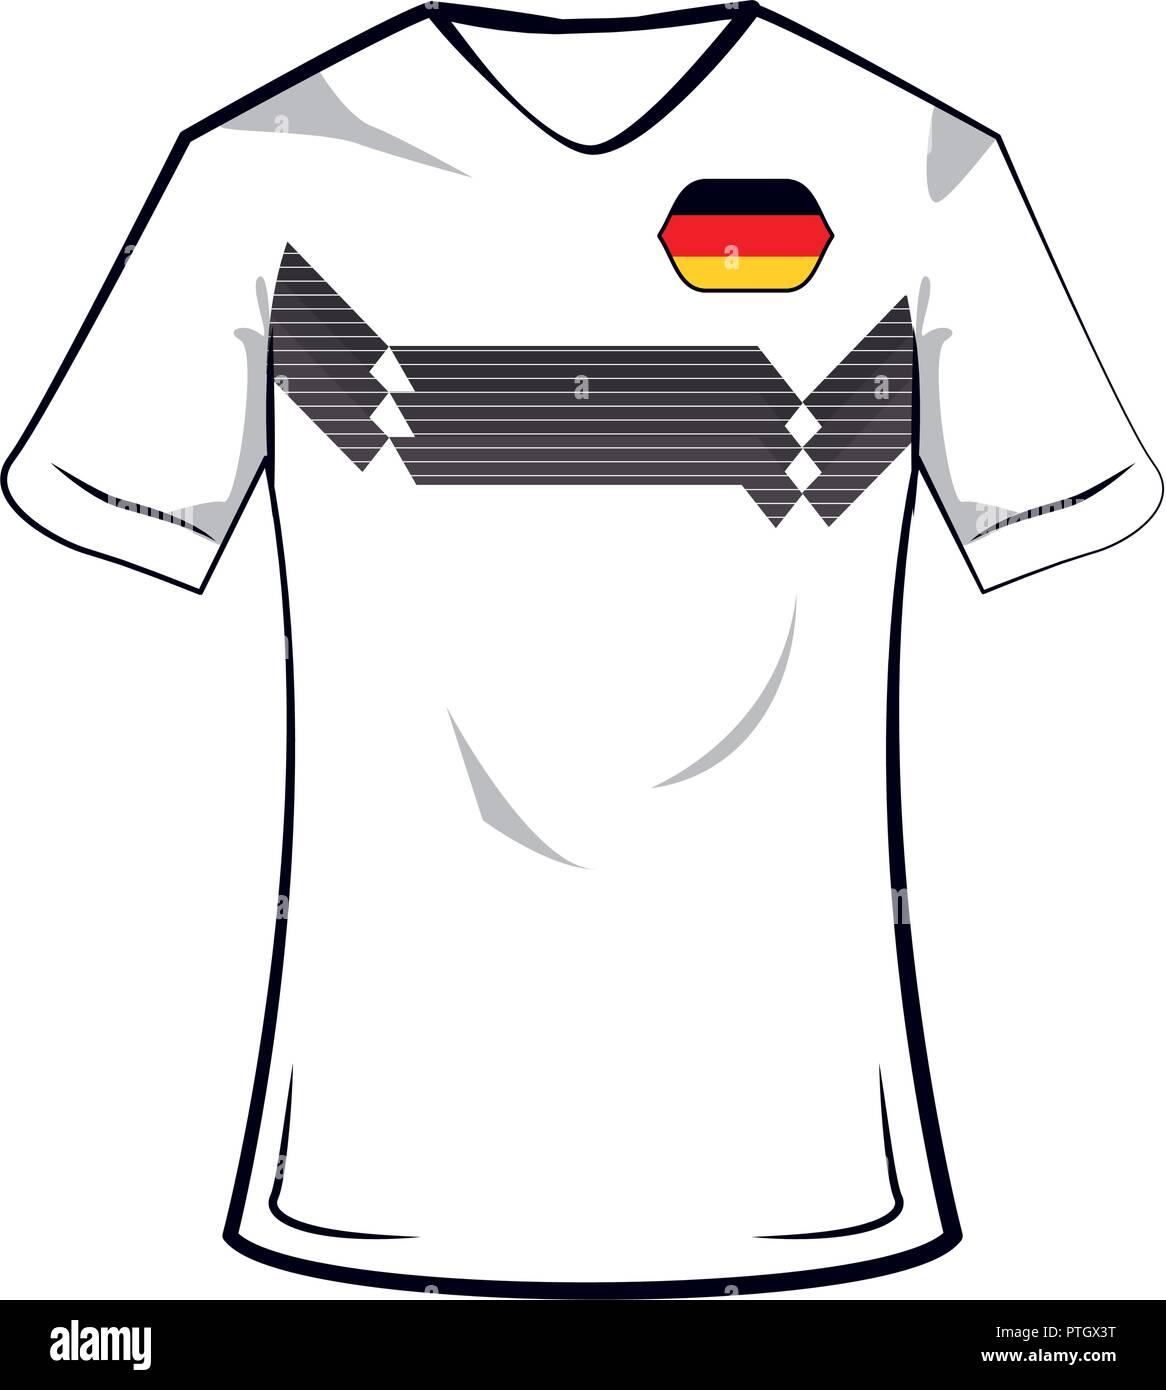 best website 7749a 25e76 Germany National Football Team Kit Stock Photos & Germany ...